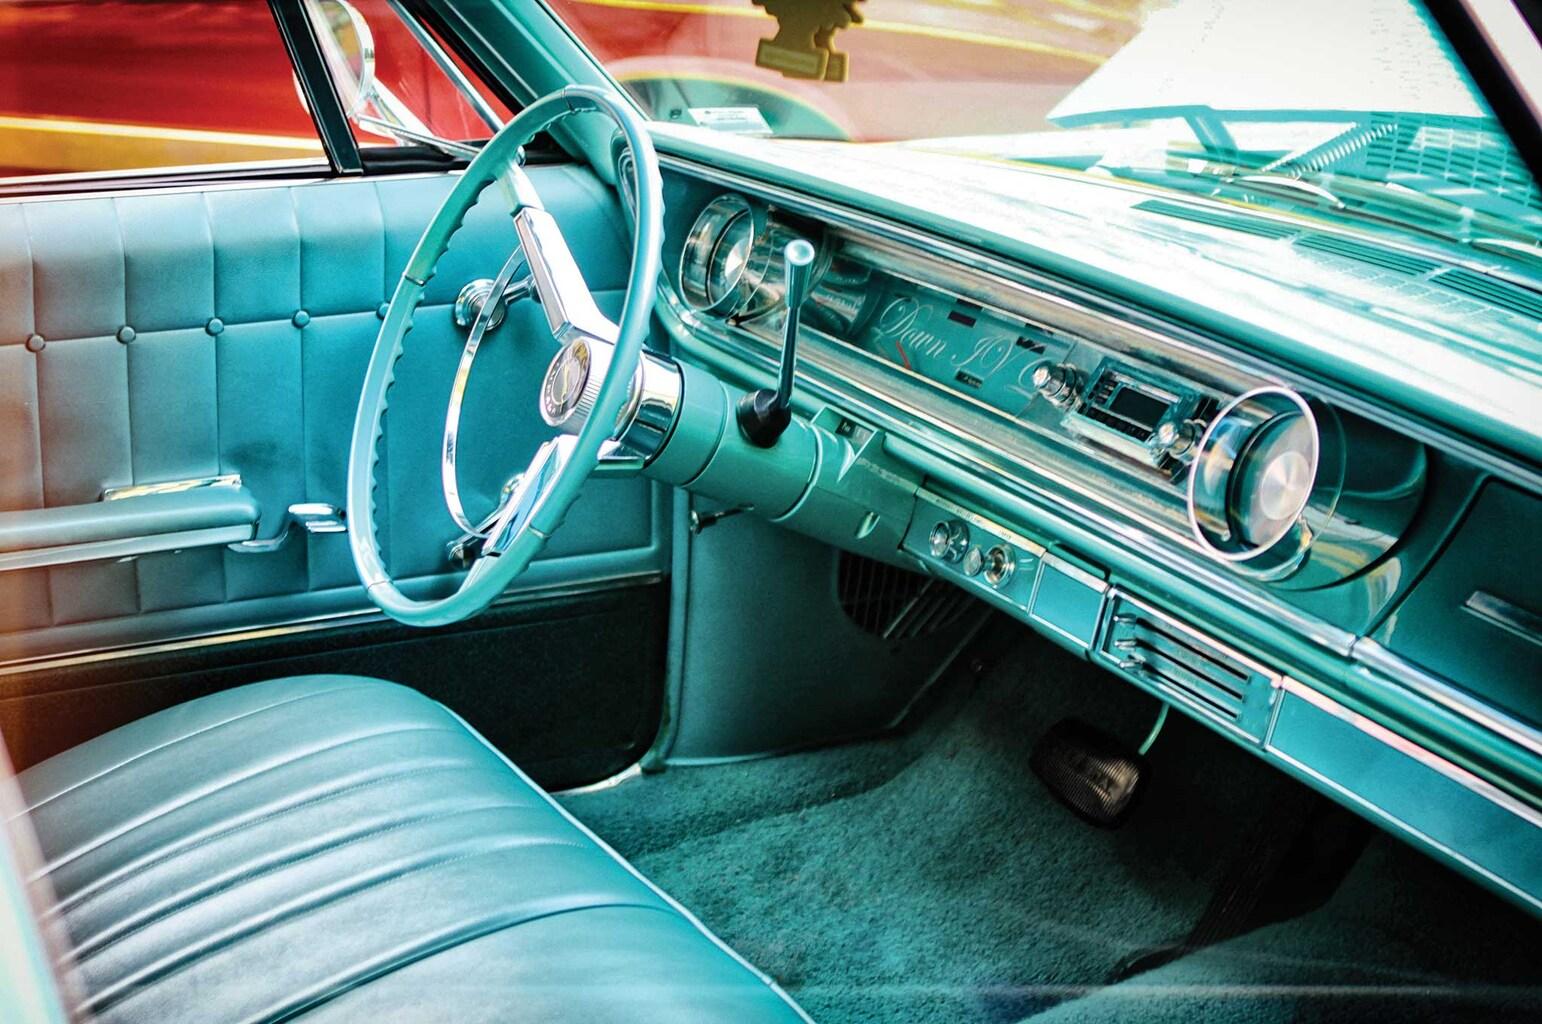 1965 Chevrolet Impala Wagon Outside The Box Lowrider